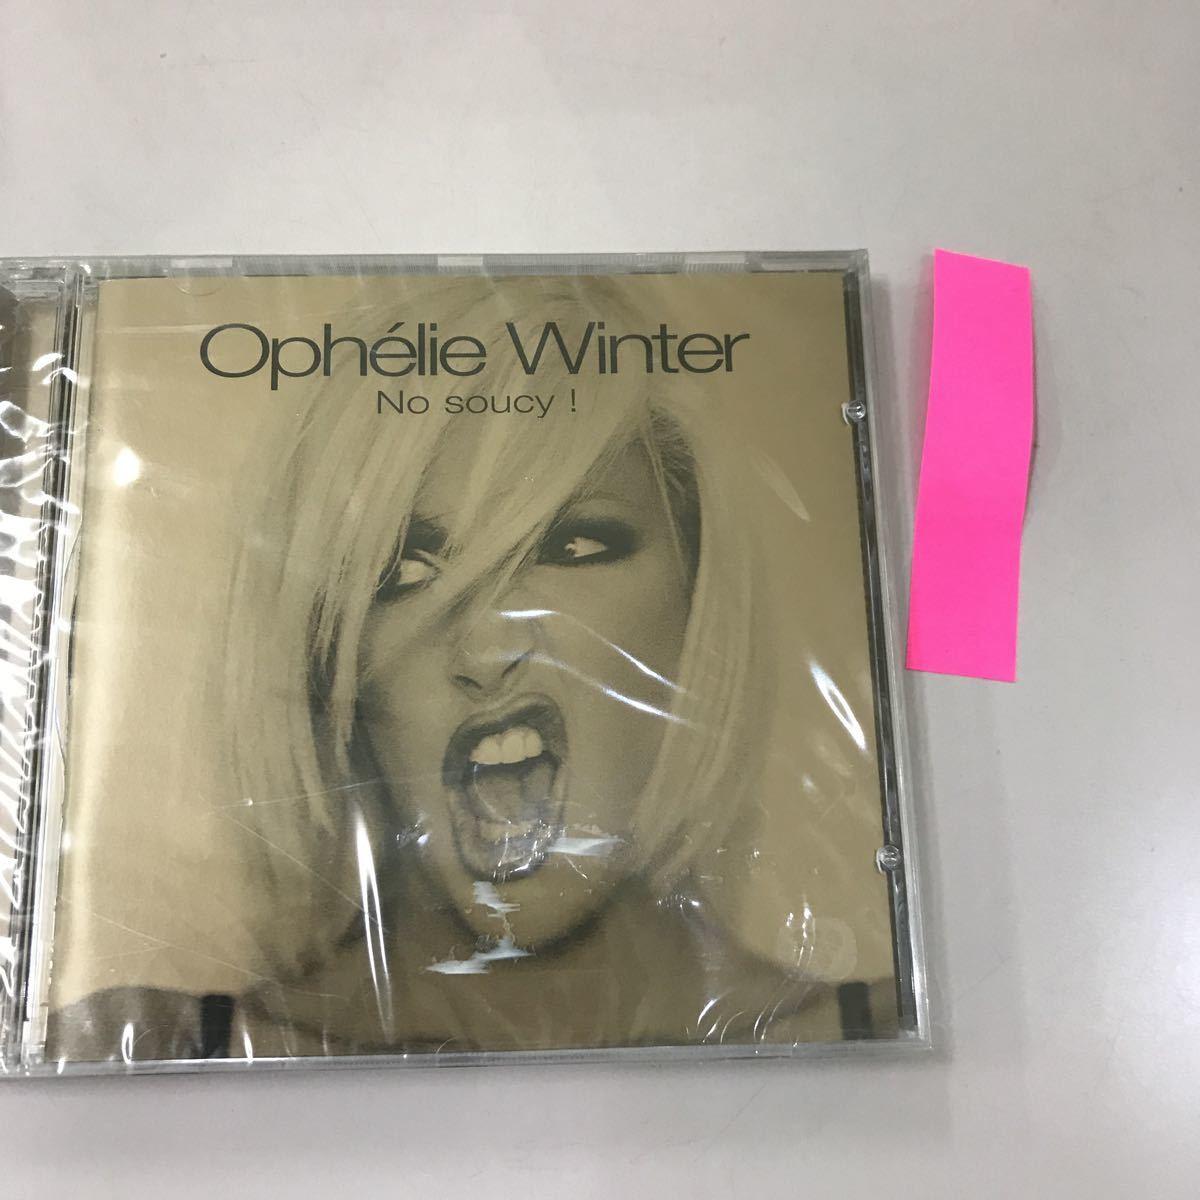 CD 輸入盤未開封【洋楽】長期保存品 mphelie winter